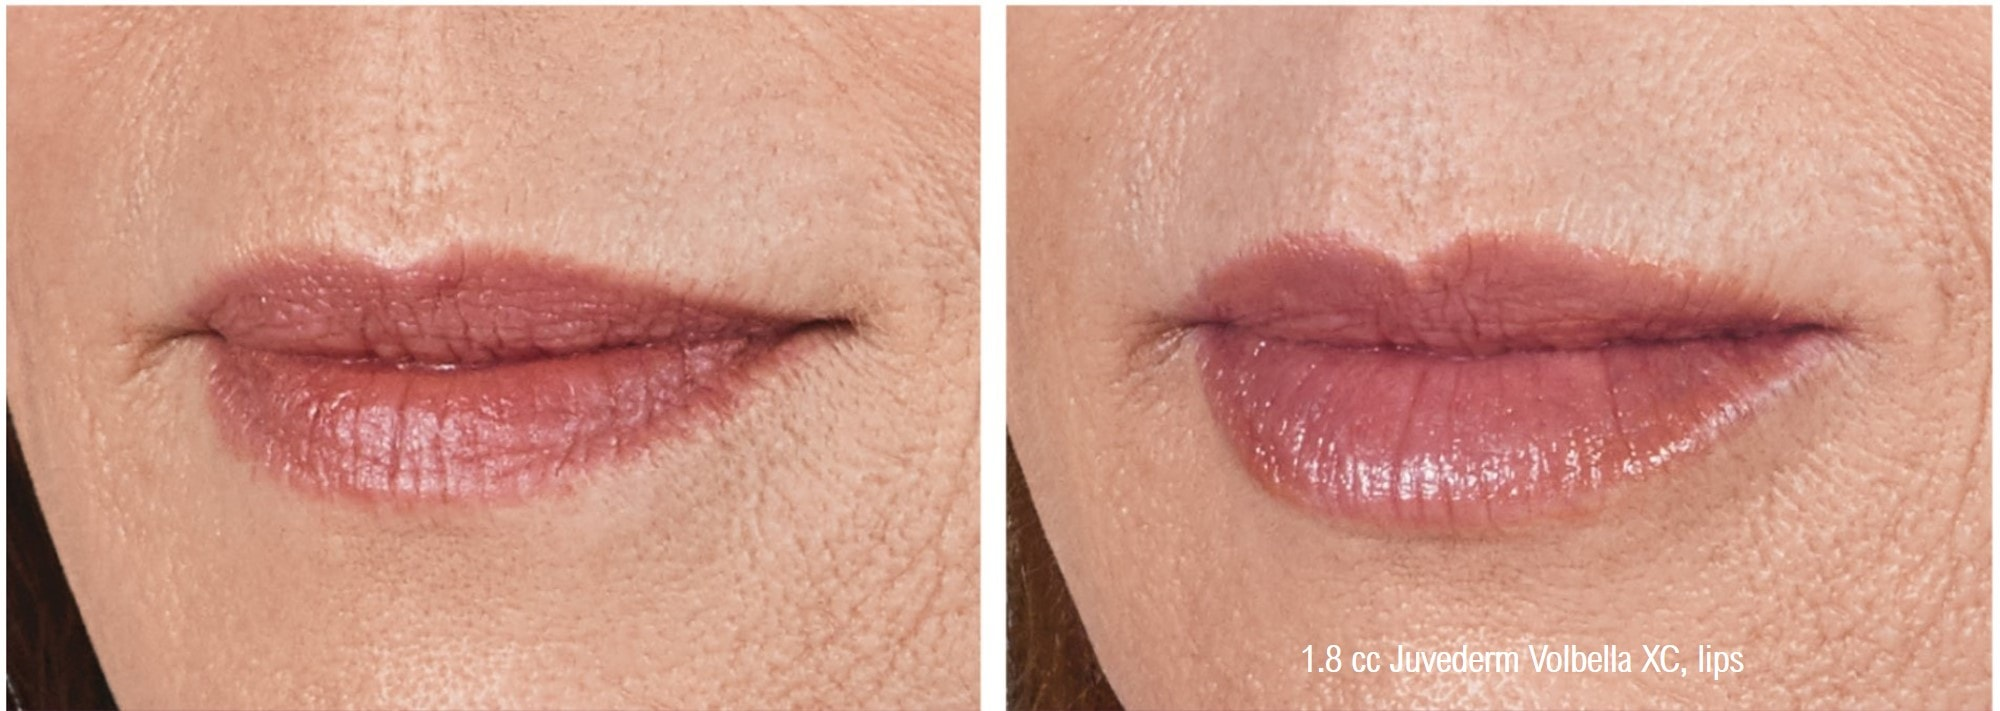 juvederm-volbella-xc-lip-augmentation-closeup-min.jpg